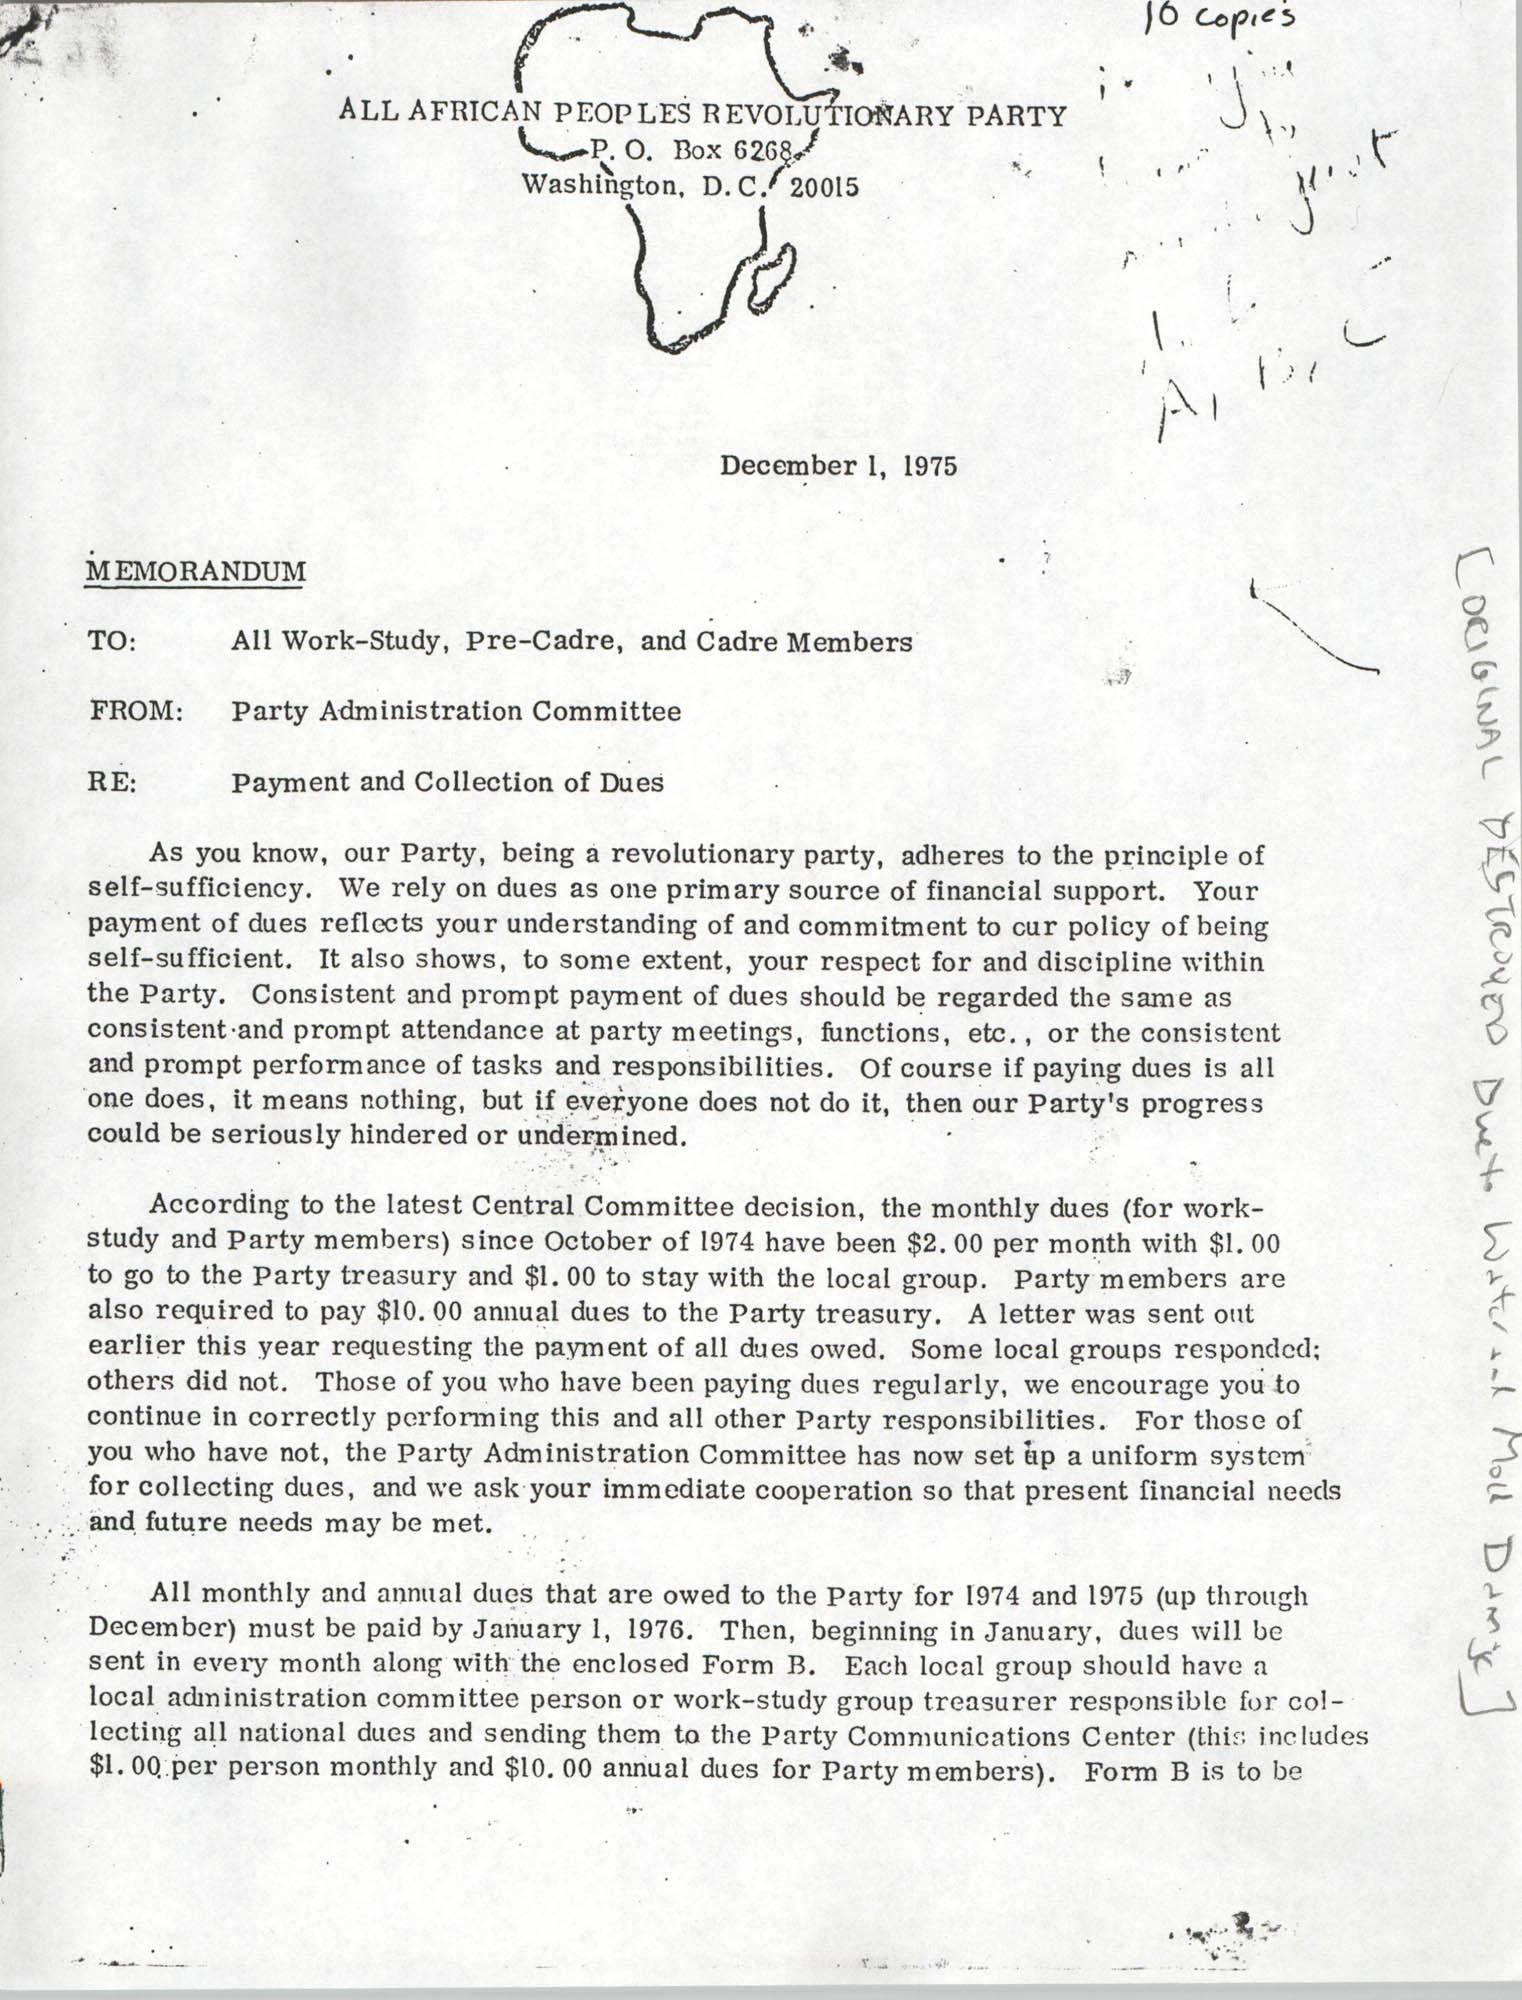 All African People's Revolutionary Party Memorandum, December 1, 1975